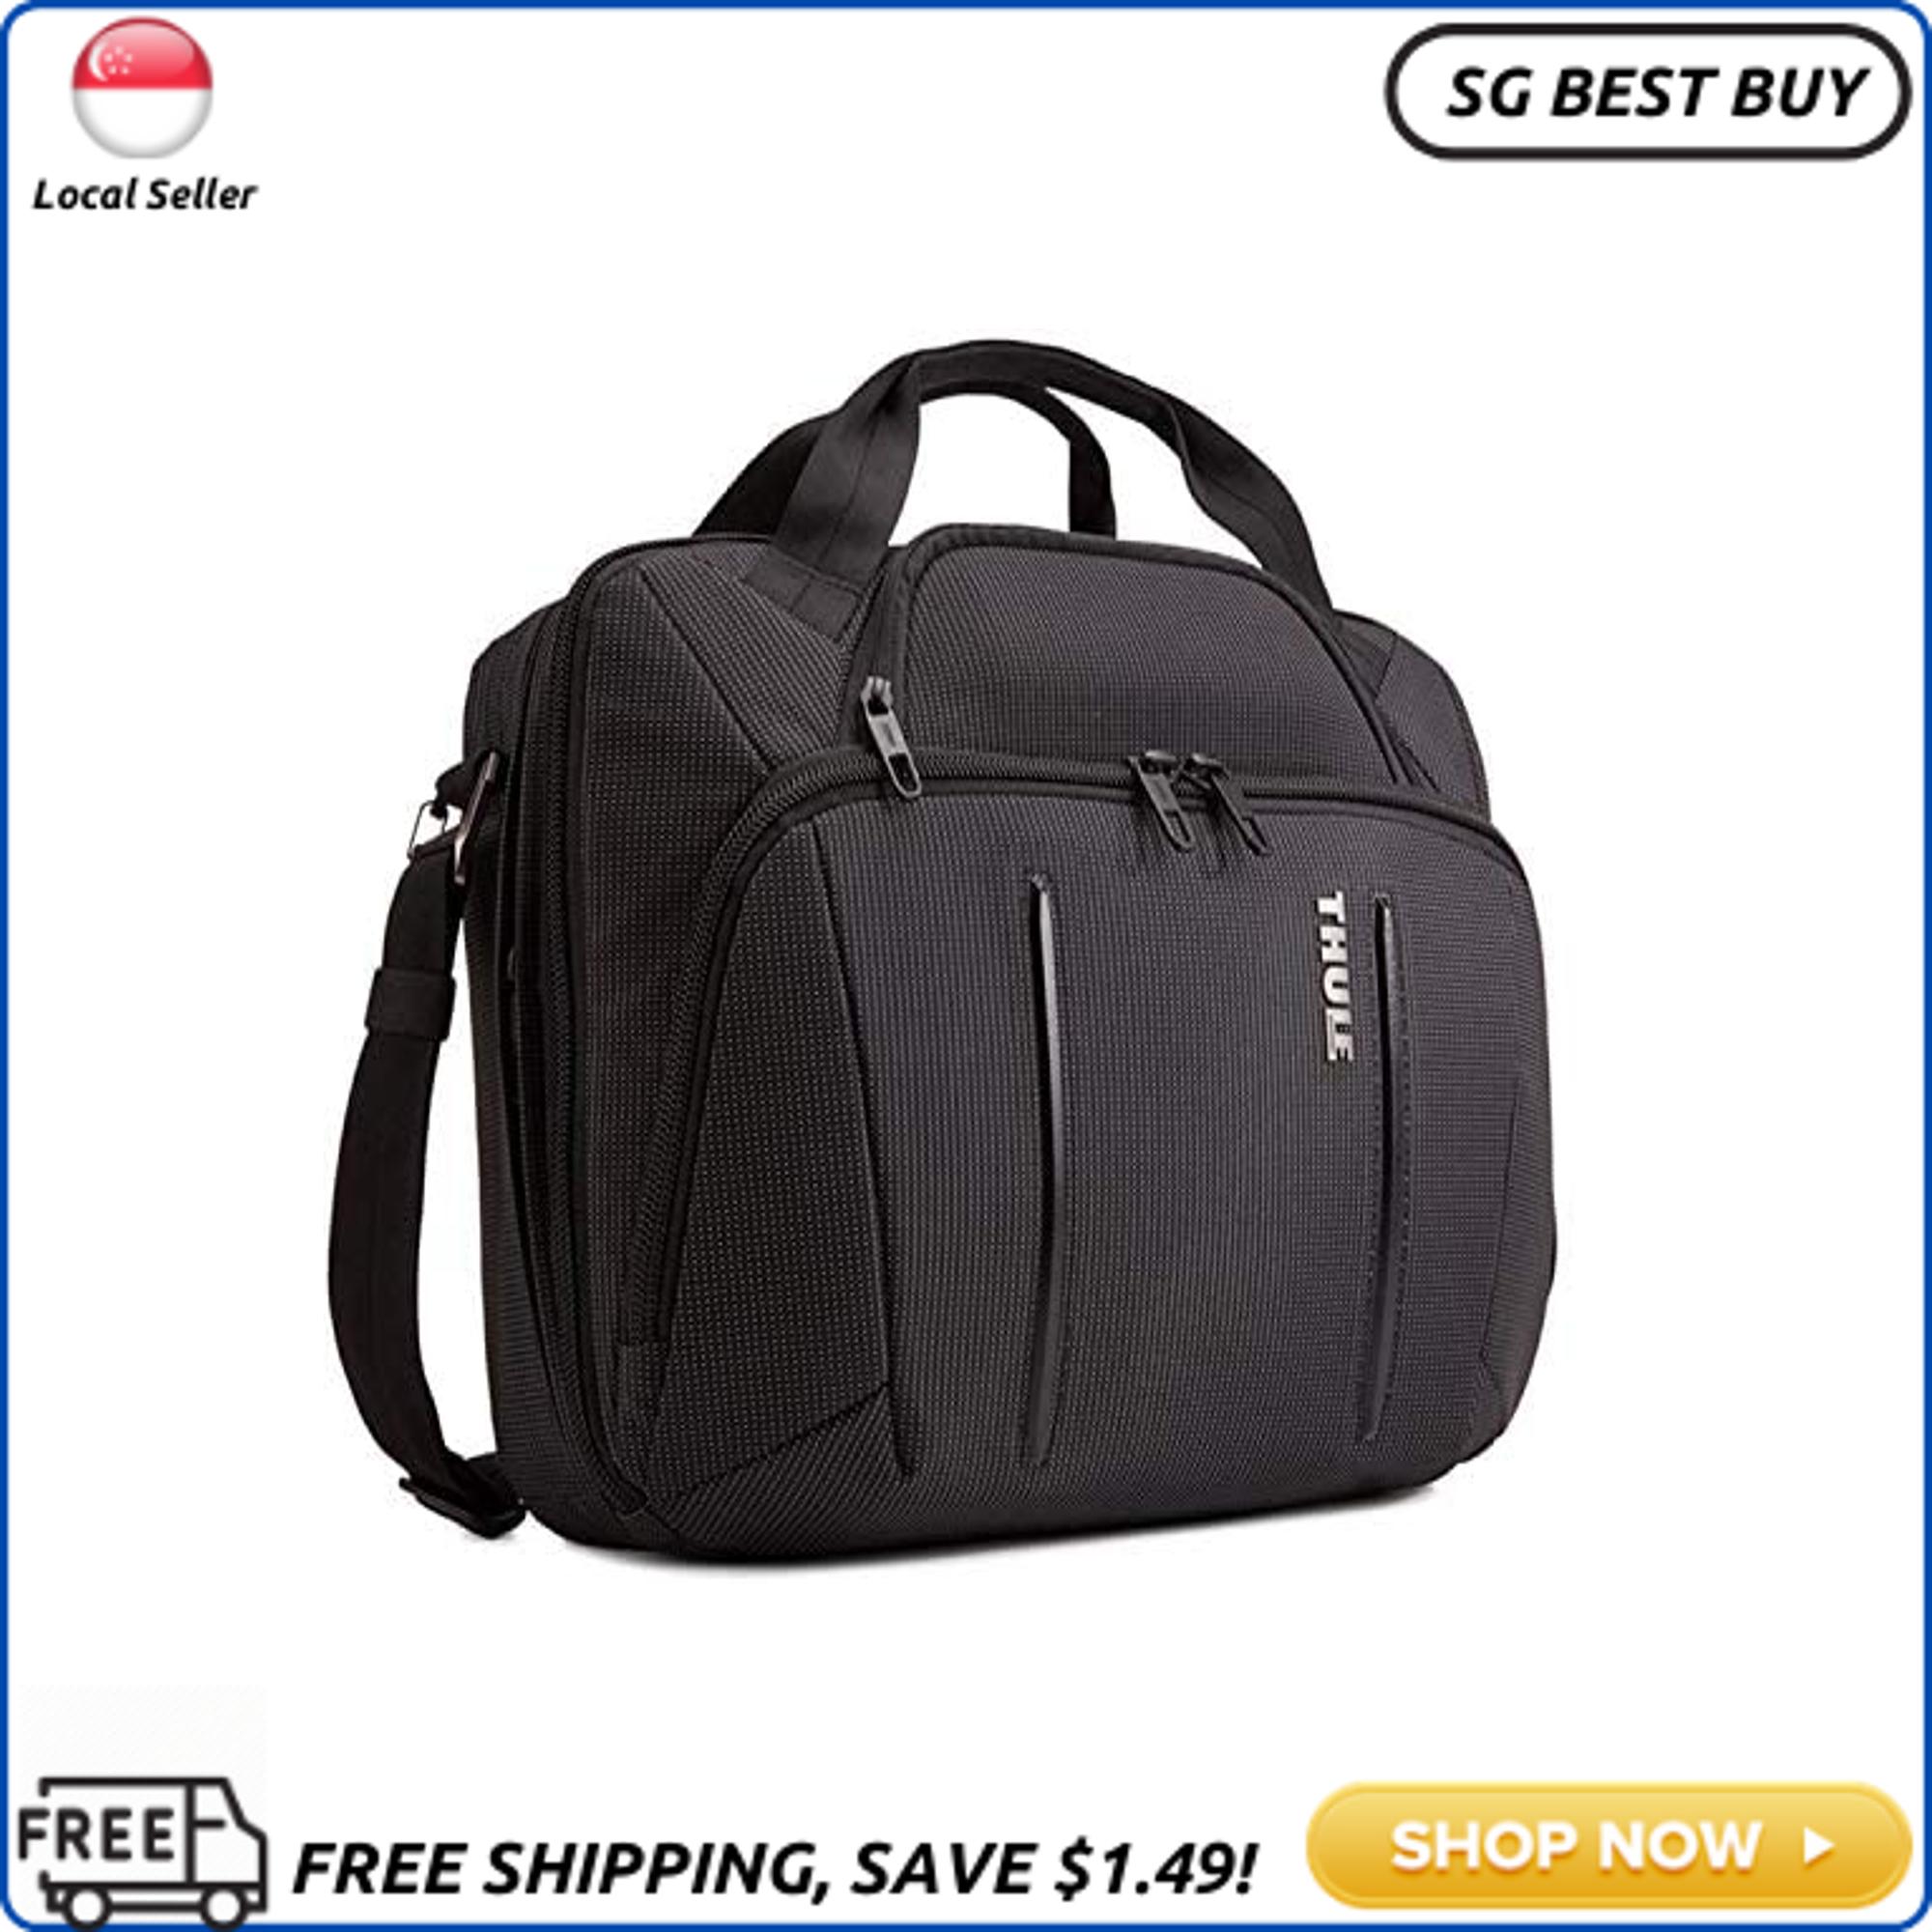 (SG SELLER) Thule Crossover 2 Laptop Bag 15.6, Black, 17.3 x 5.9 x 12.6 in